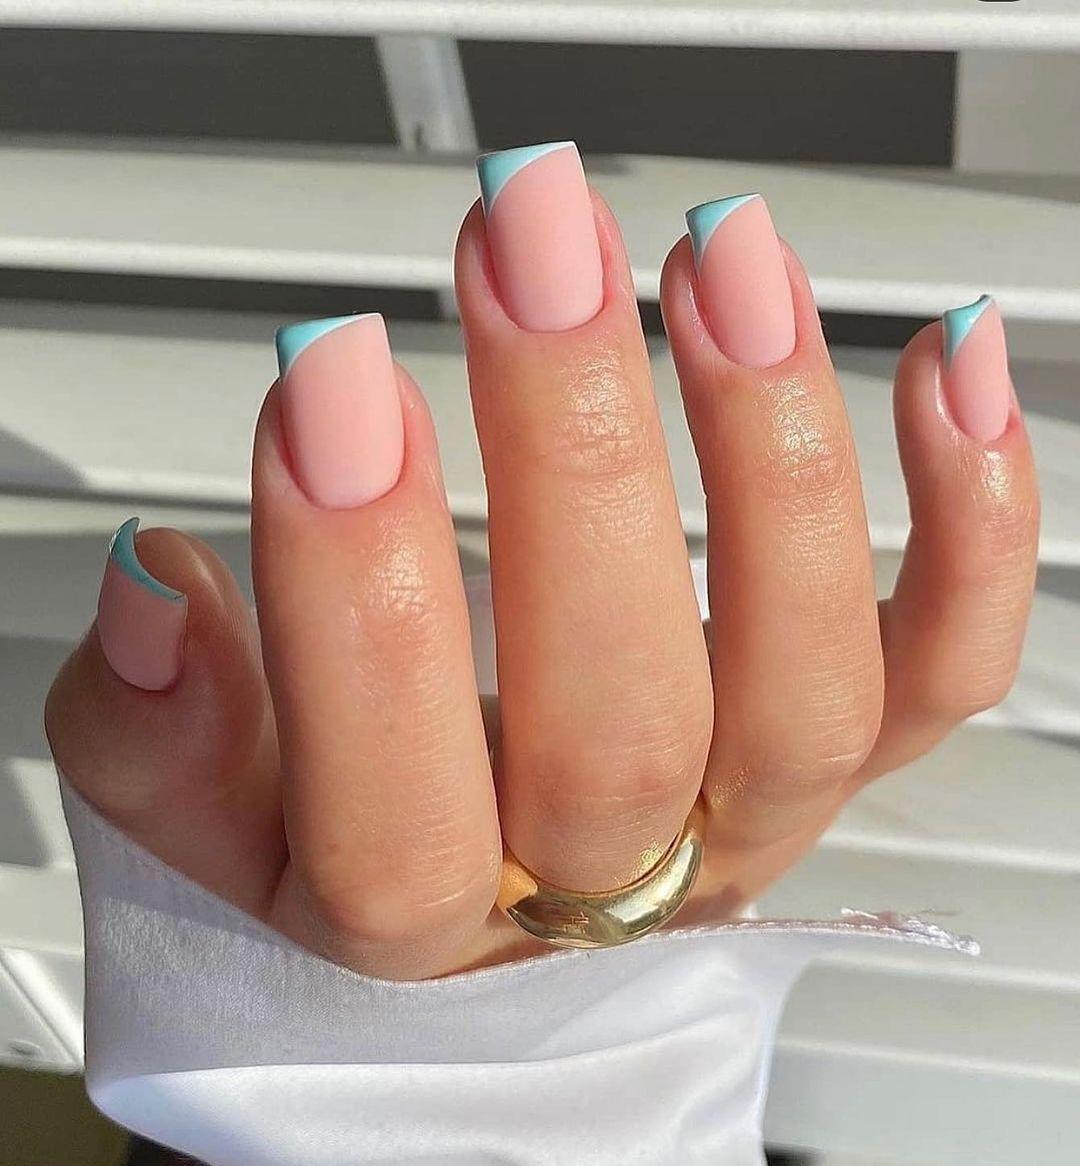 clear nails with francesinha 4